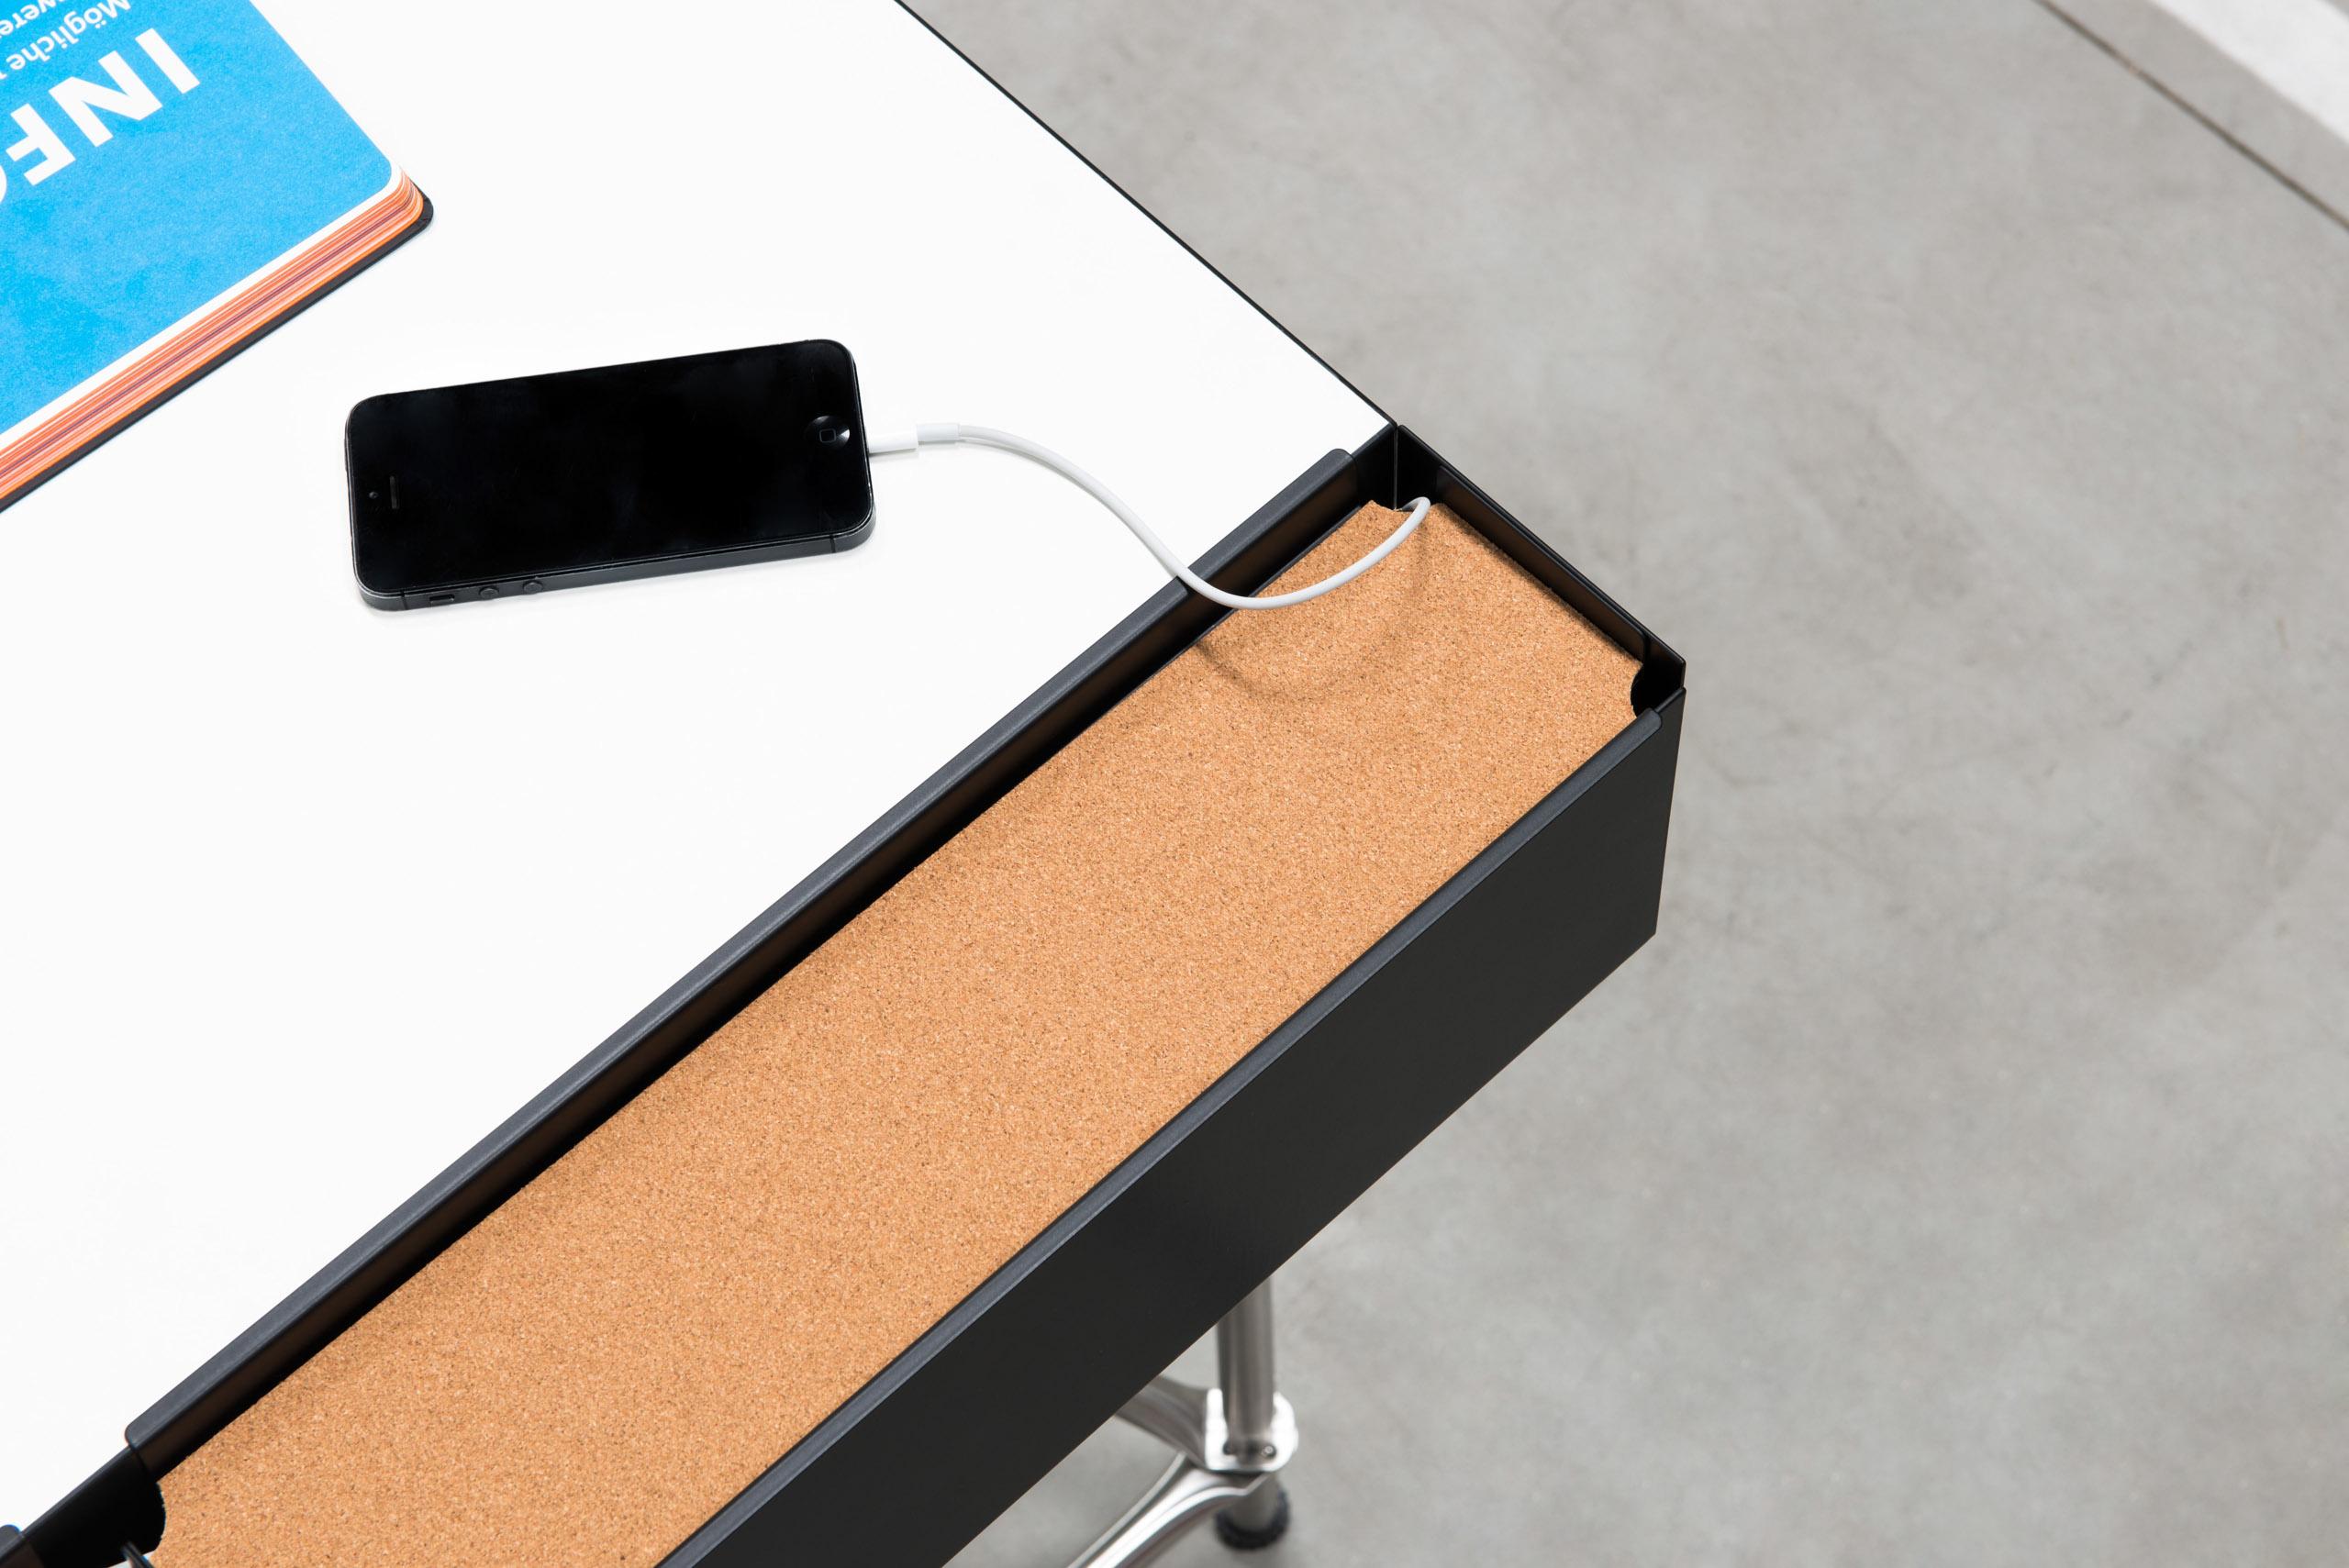 bilder rackpod system 180 modulare einrichtung aus berlin. Black Bedroom Furniture Sets. Home Design Ideas